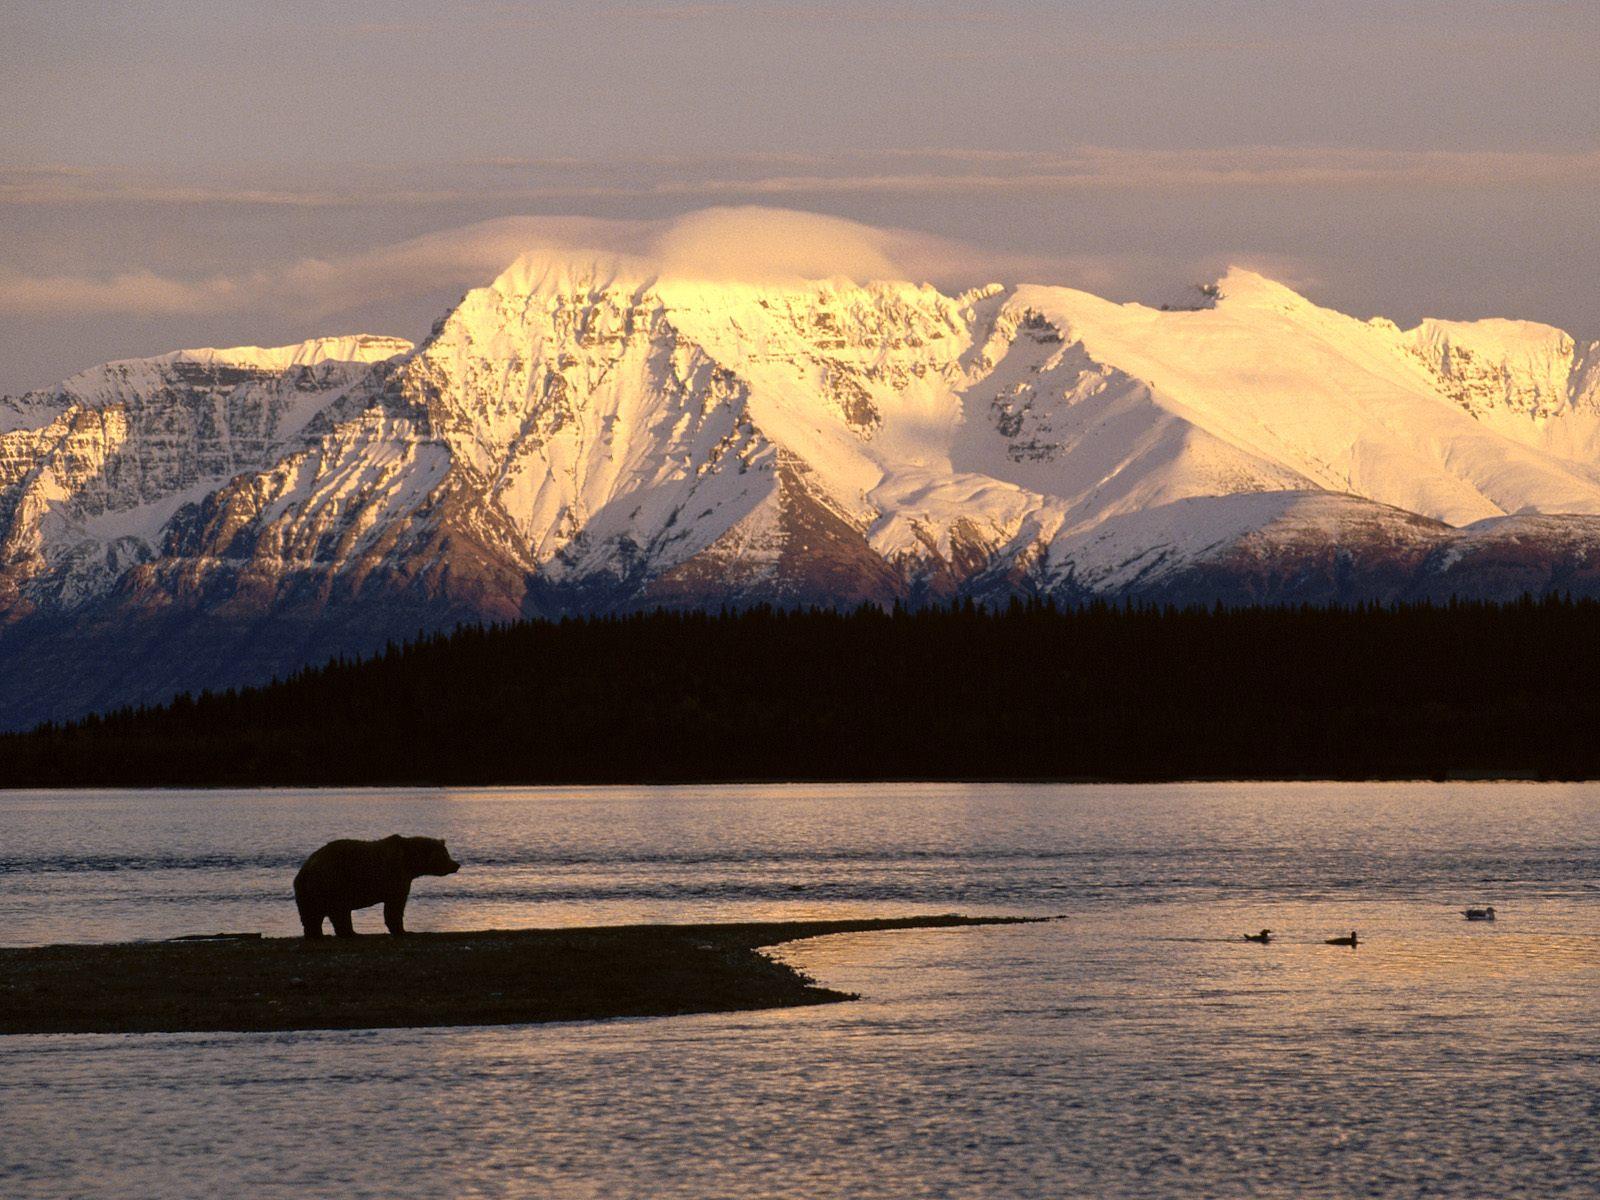 Apple Wallpapers Alaska Cute Travel Pictures Alasca Desktop On Mac 1600x1200